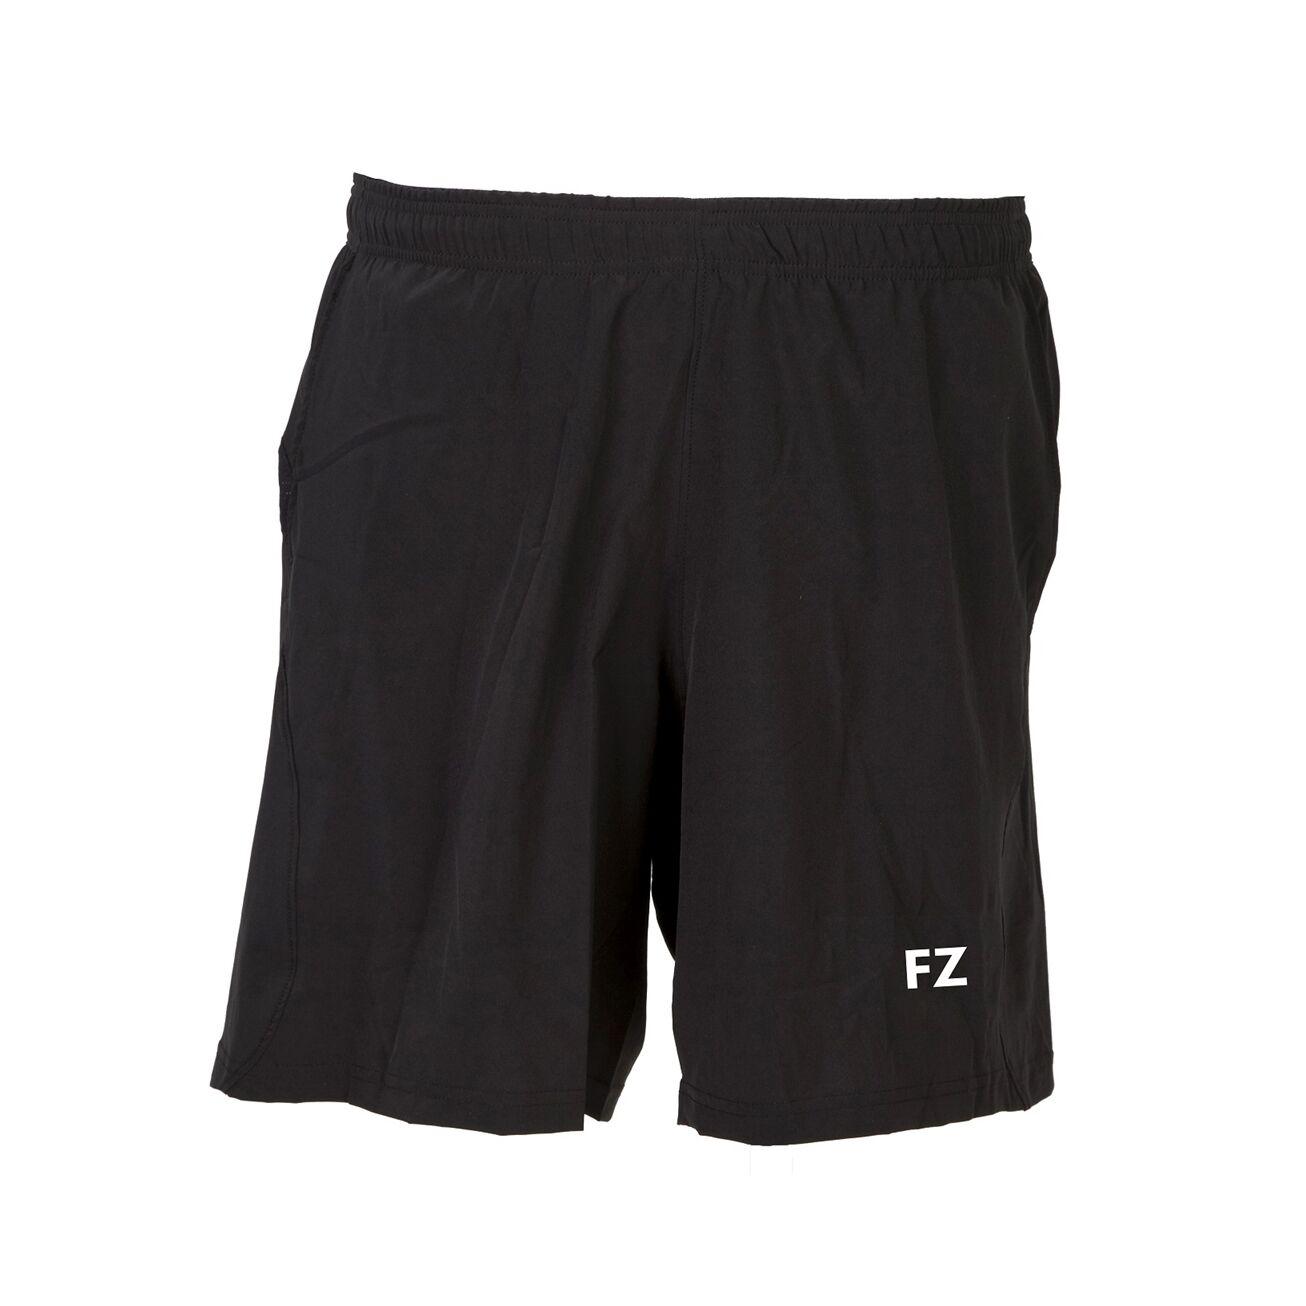 FZ Forza Ajax Shorts Men Black L